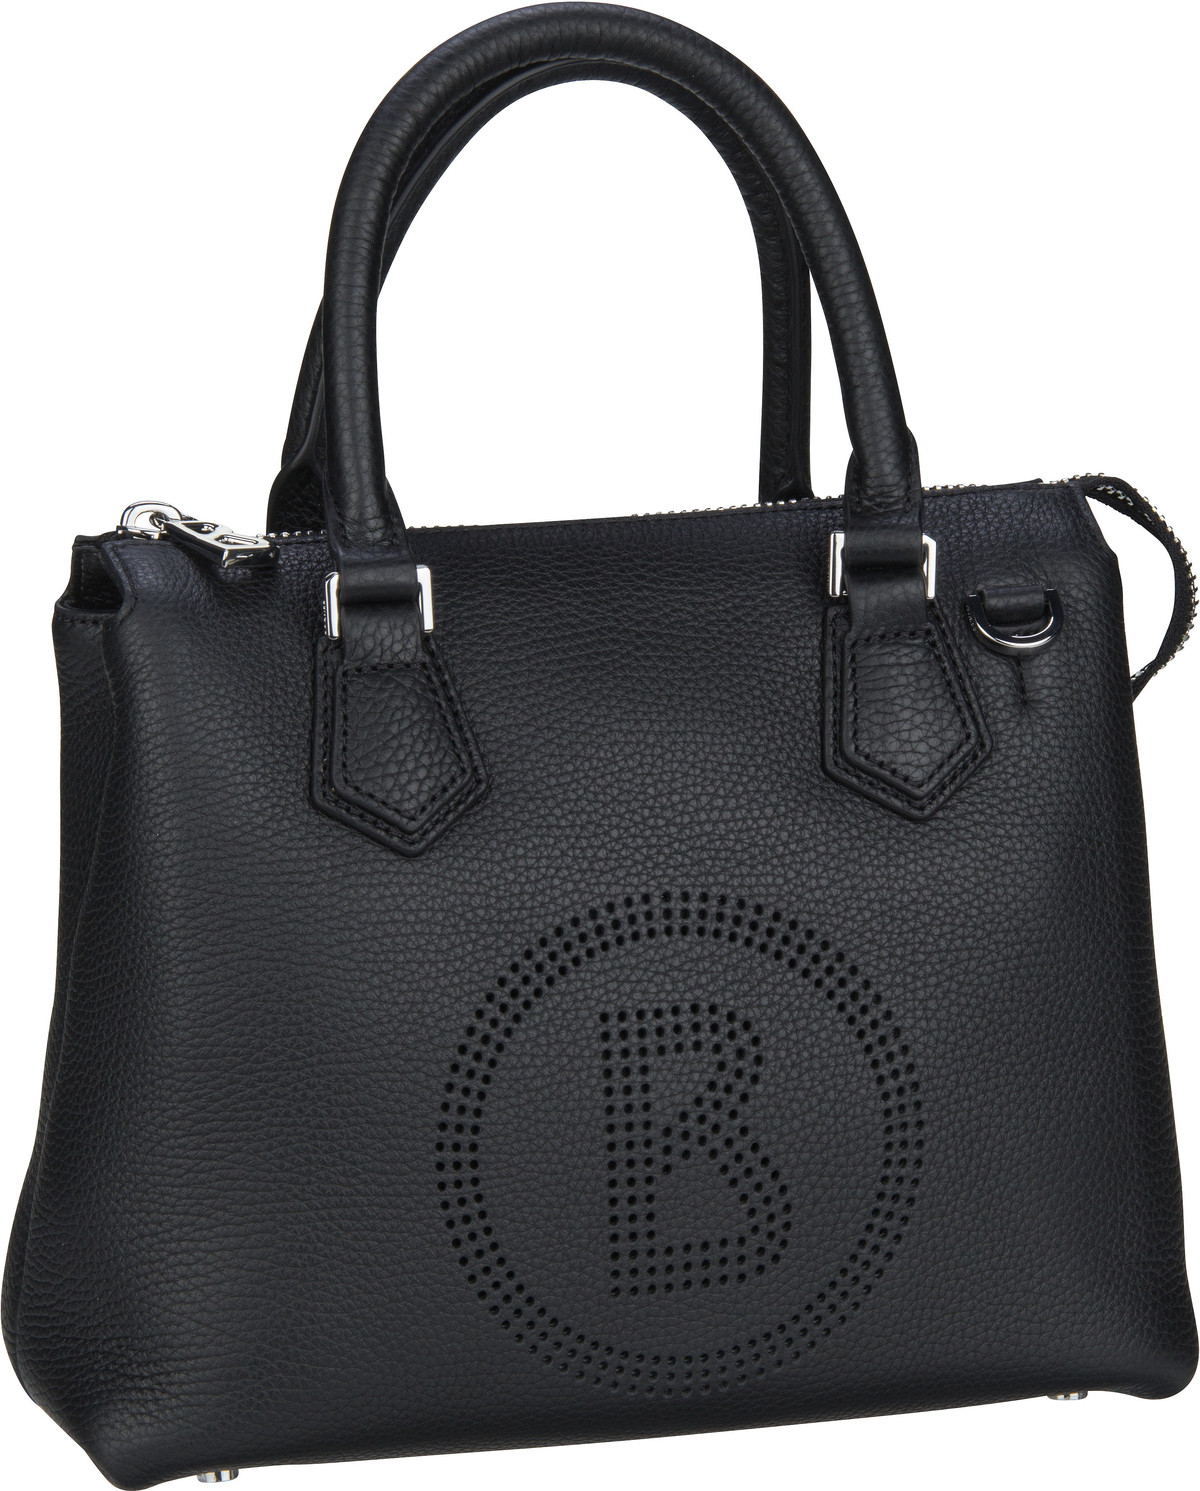 Handtasche Sulden Frida HandBag SHZ Black